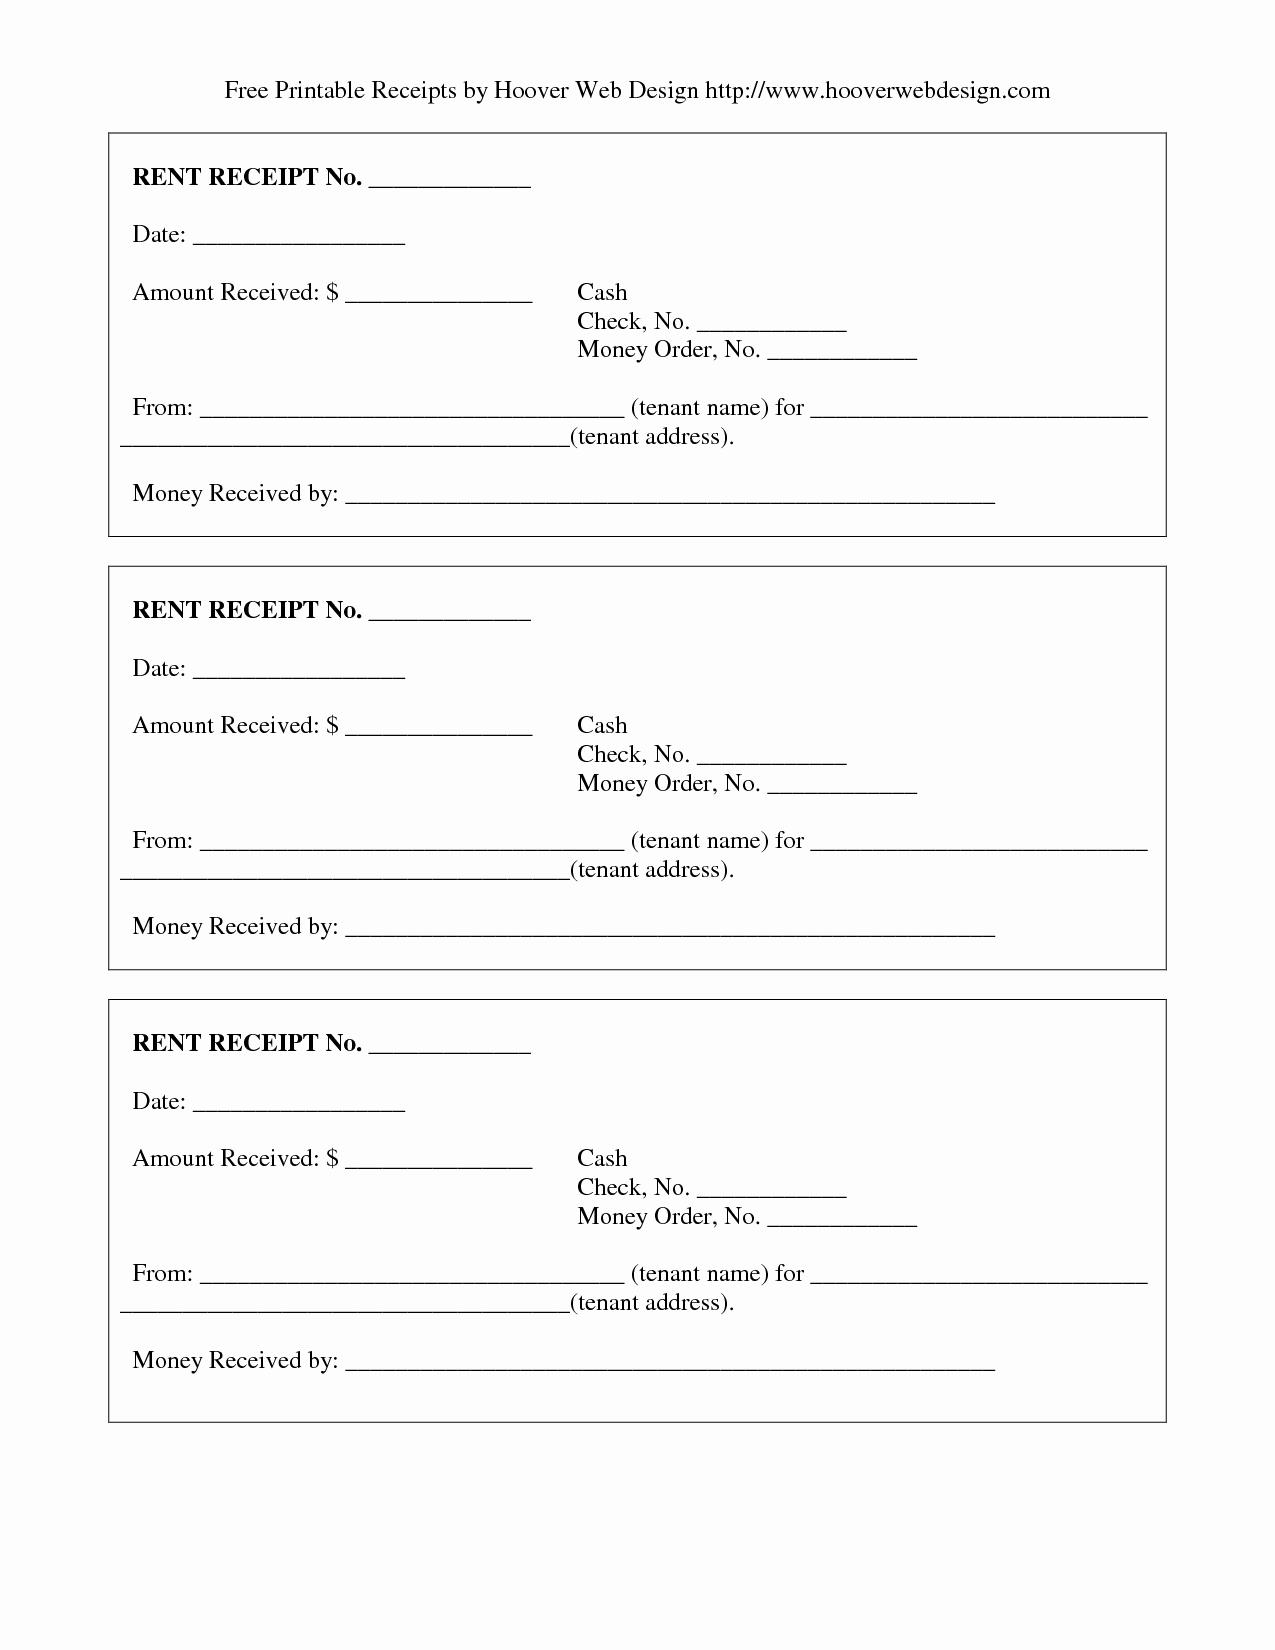 Rent Invoice Template Pdf Luxury Free Rent Receipt Free Printable Documents